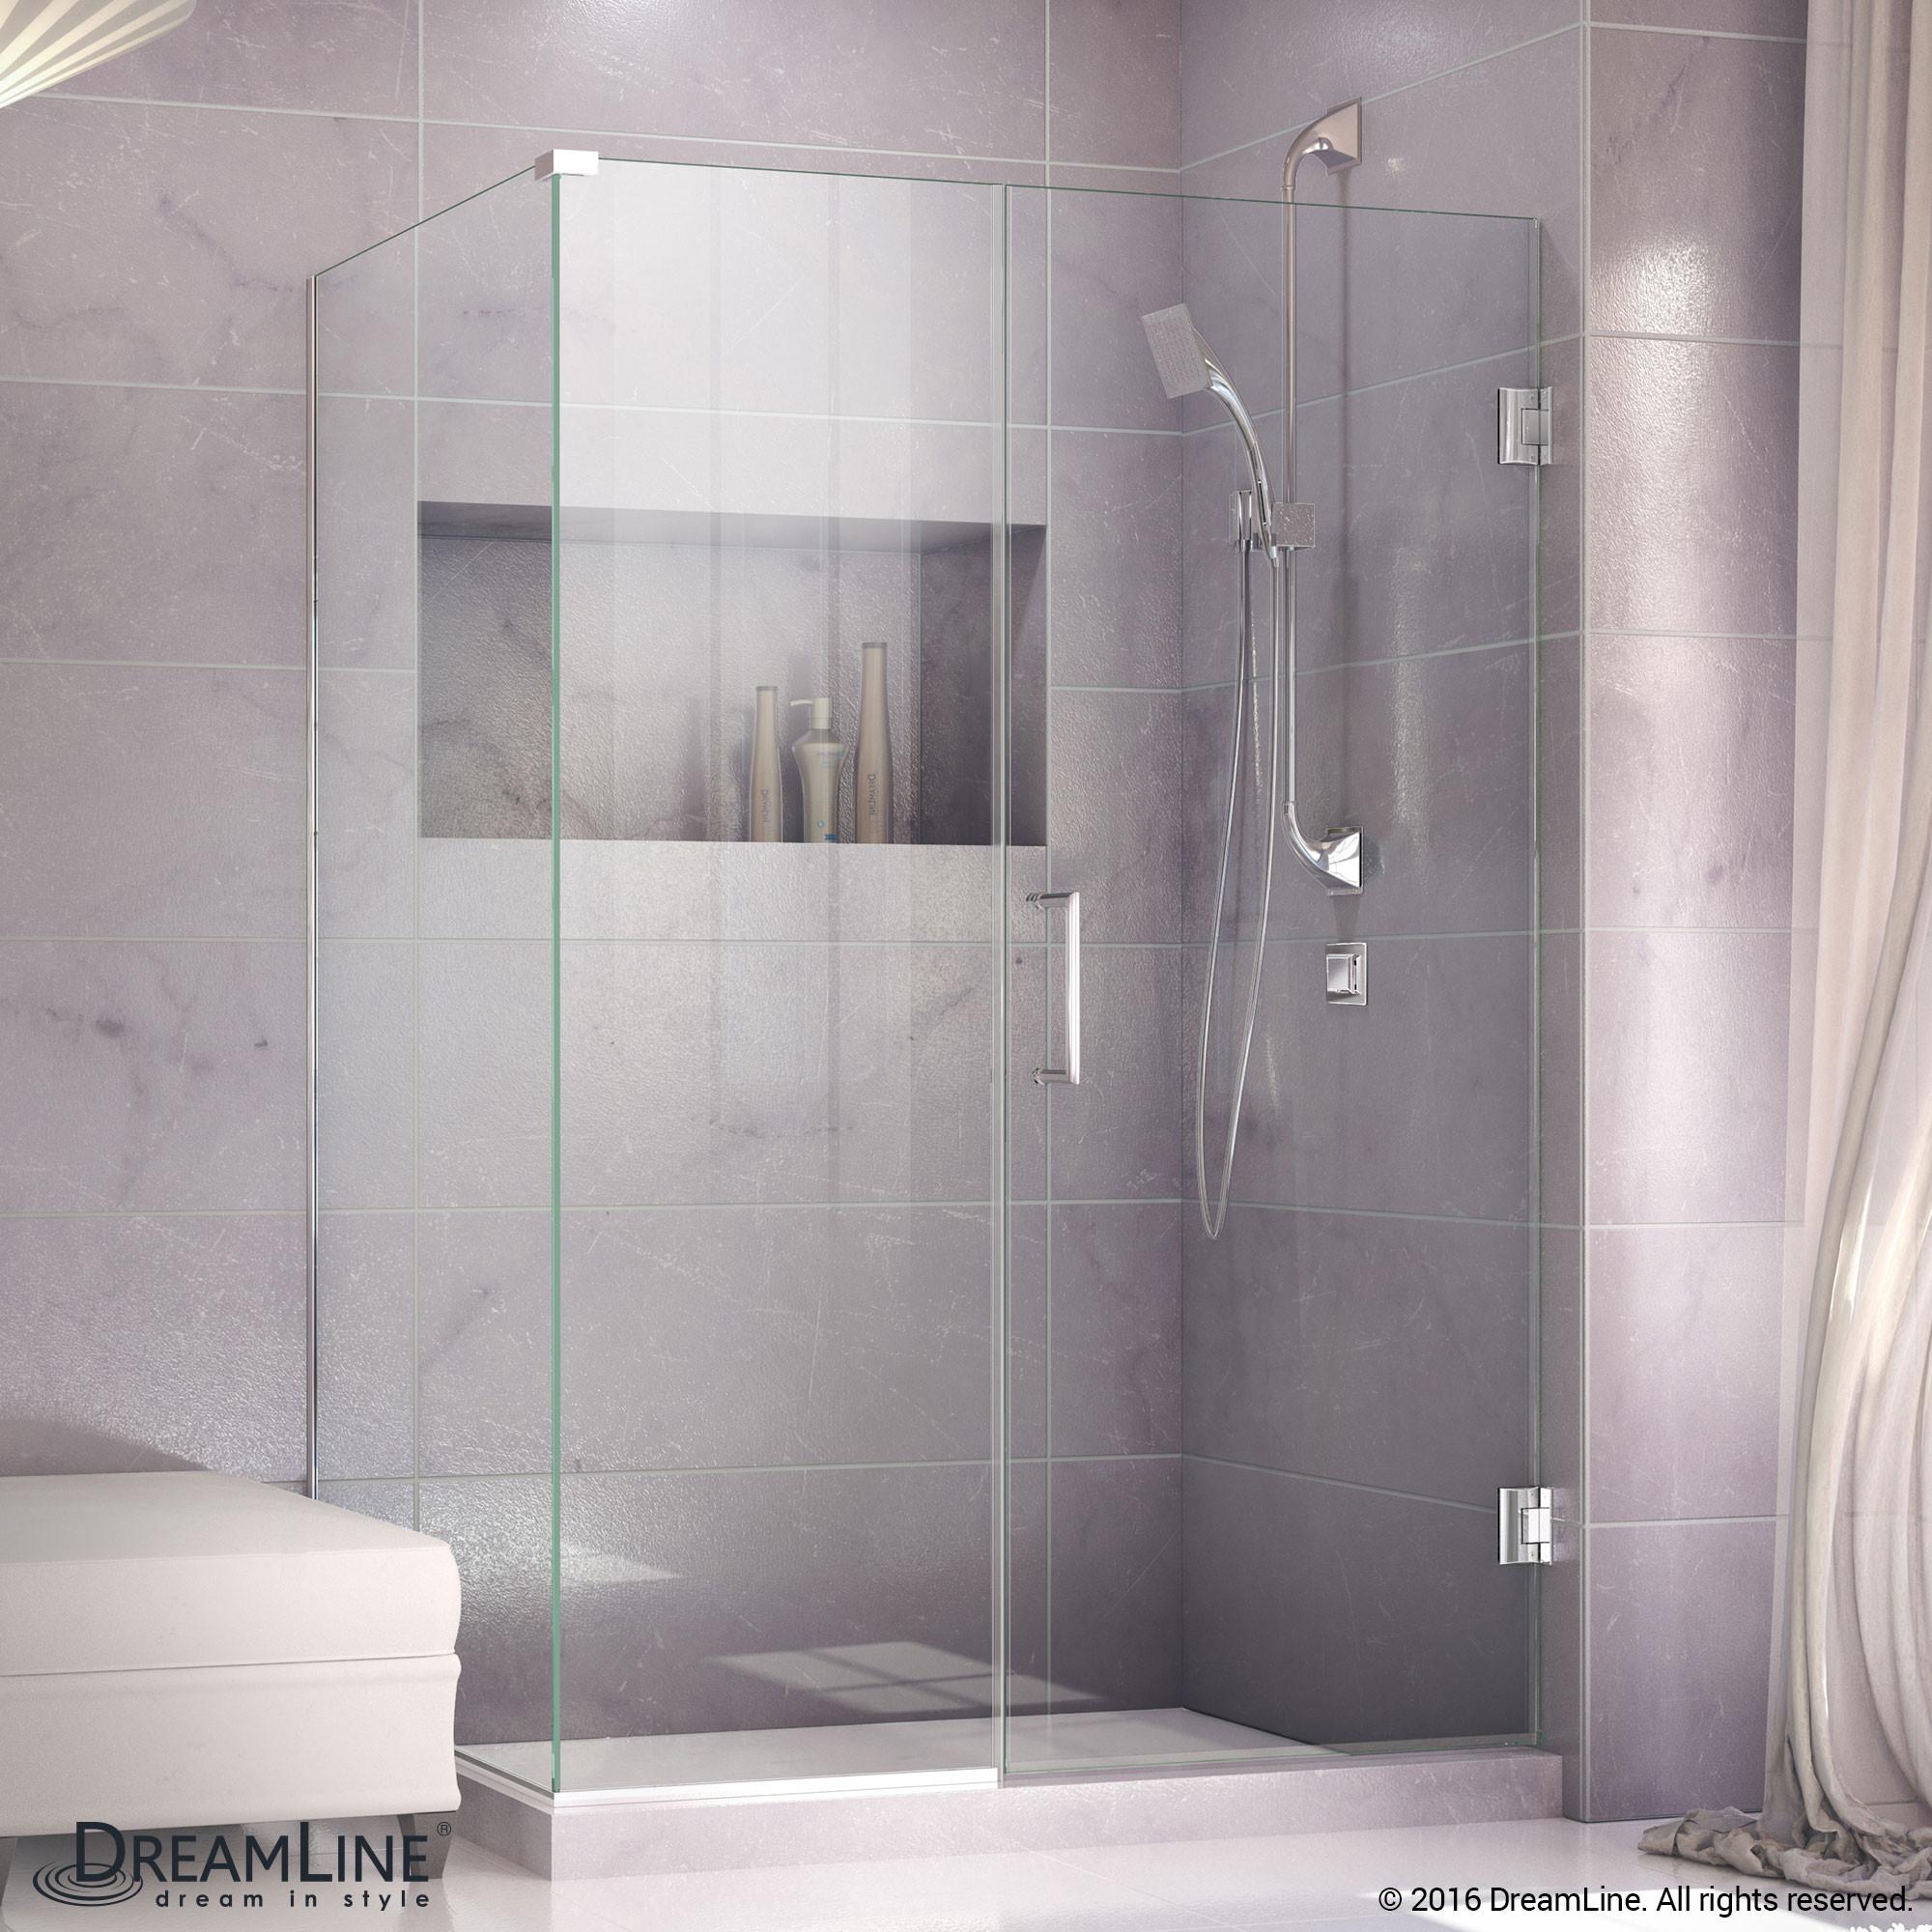 DreamLine SHEN-24430340-01 Unidoor Plus Hinged Shower Enclosure In Chrome Finish Hardware